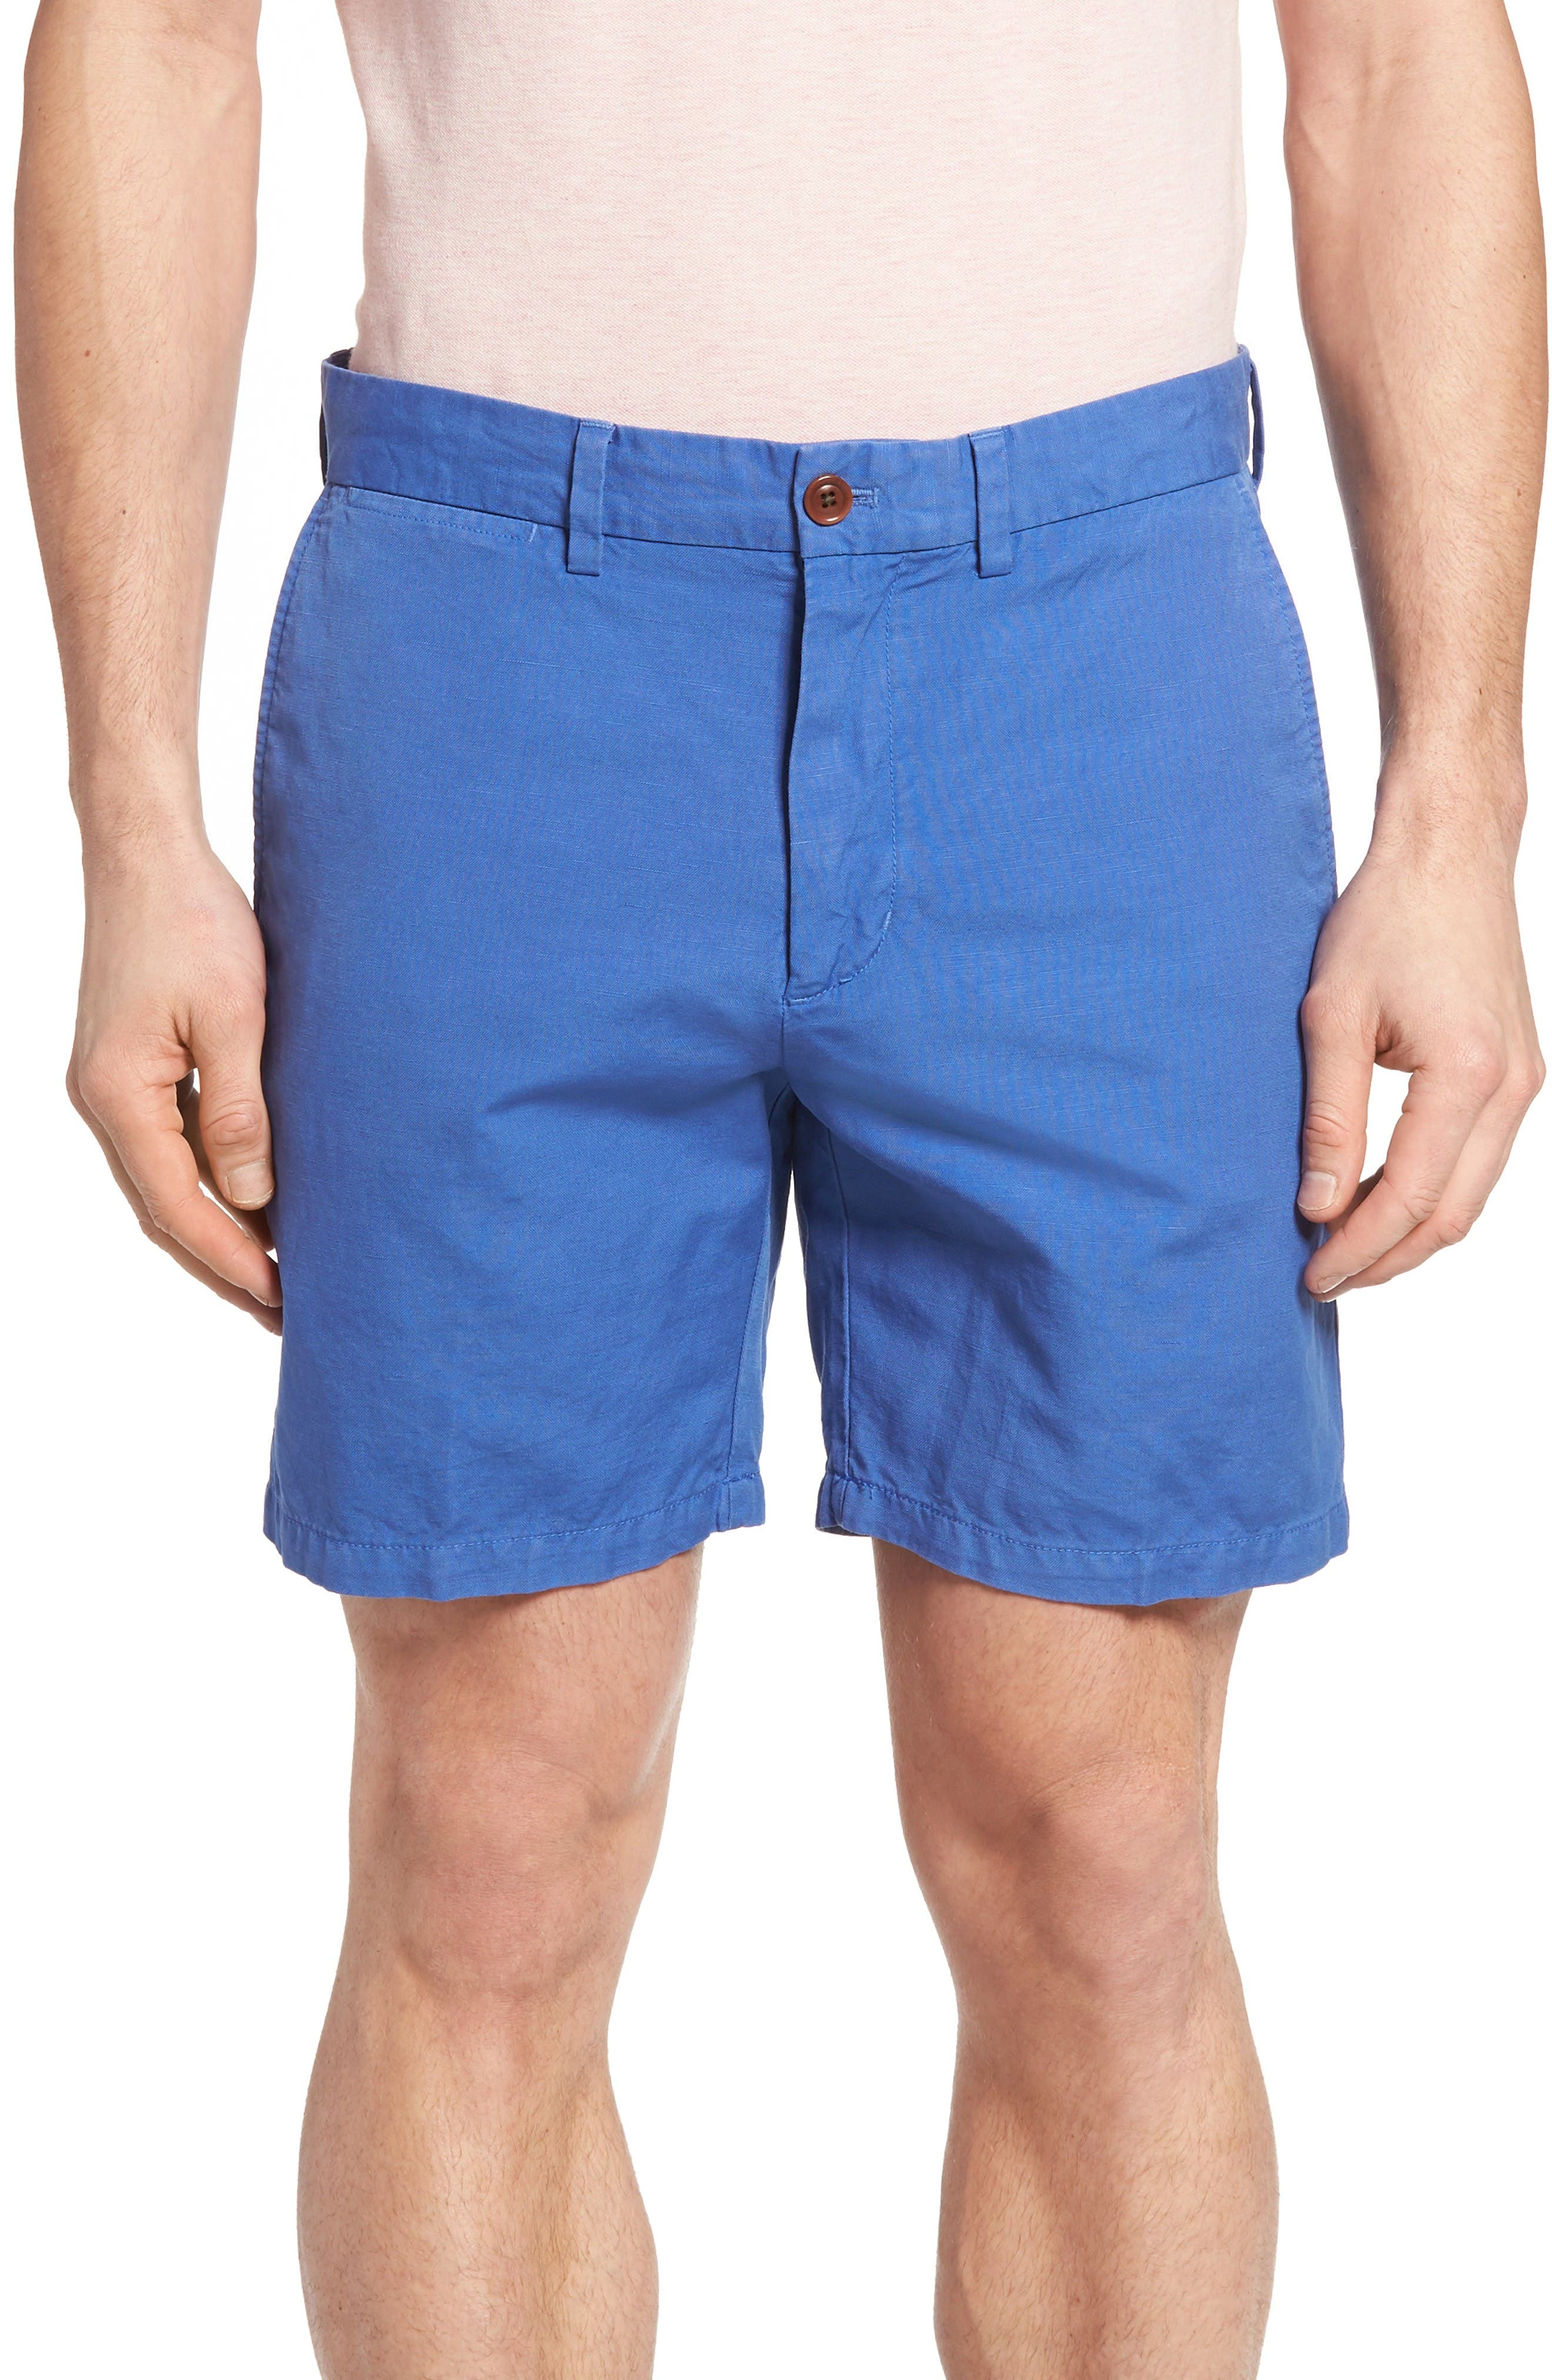 Vineyard Vines 9-Inch Shorts